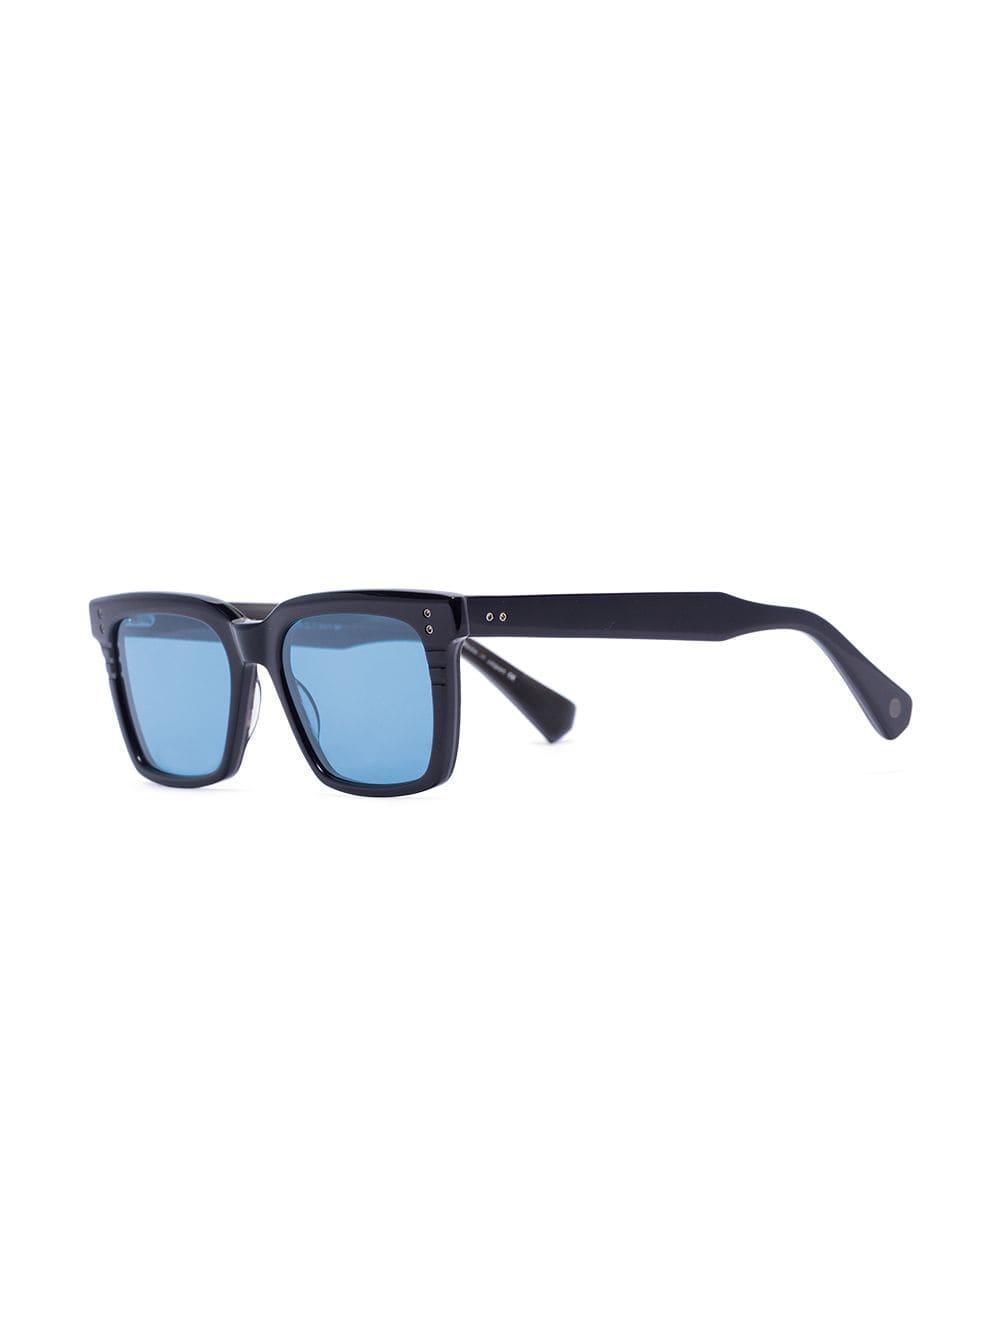 a33f379bea4 Dita Eyewear Drx Sequoia Square Sunglasses in Black for Men - Lyst